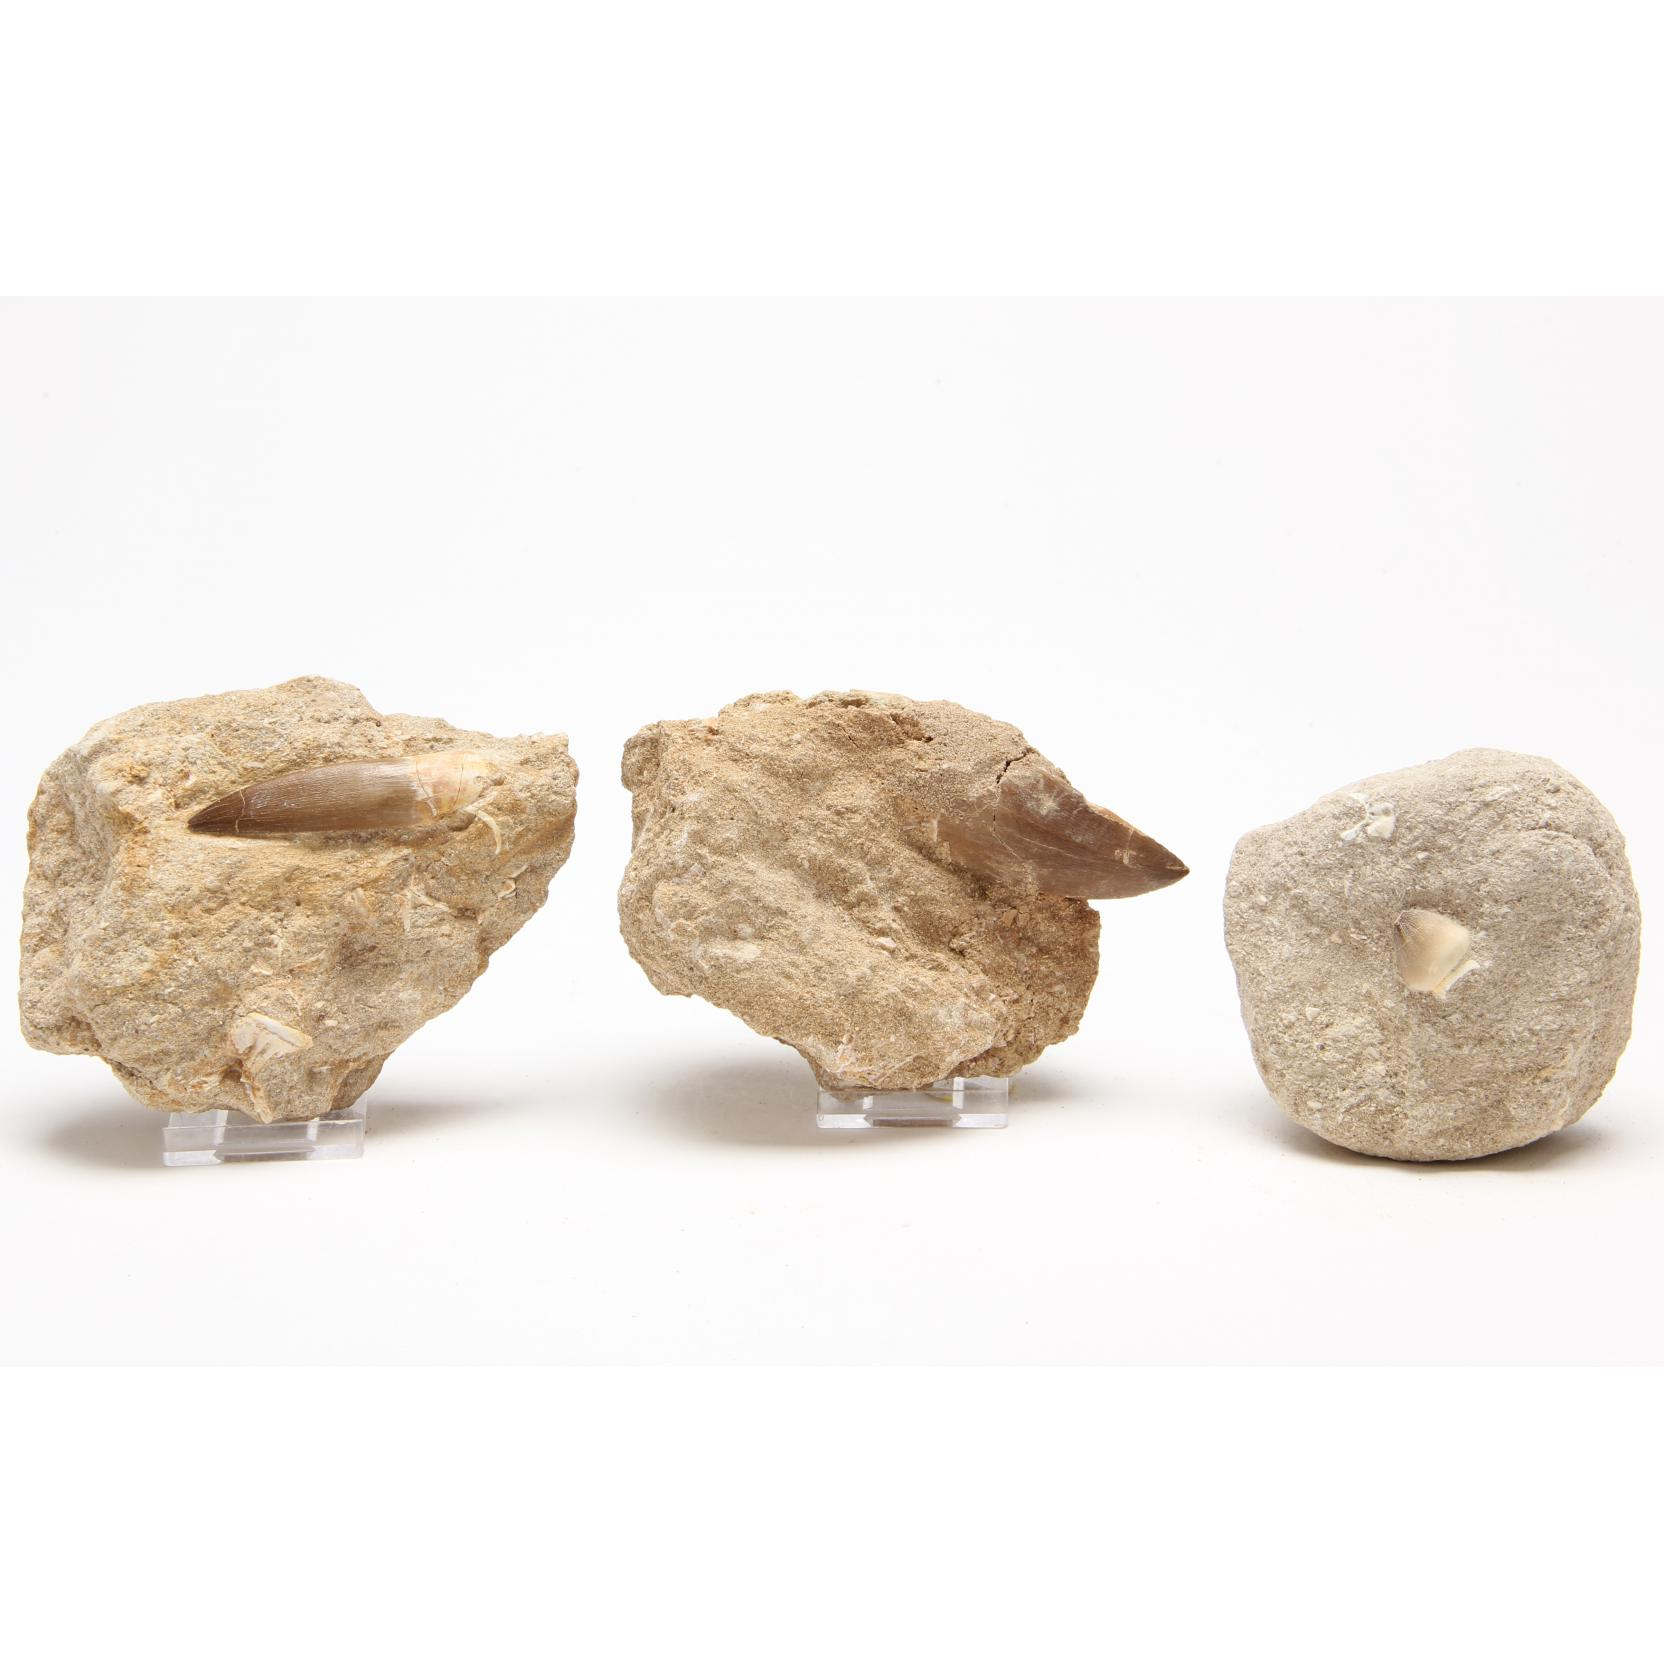 three-individual-mosasaur-teeth